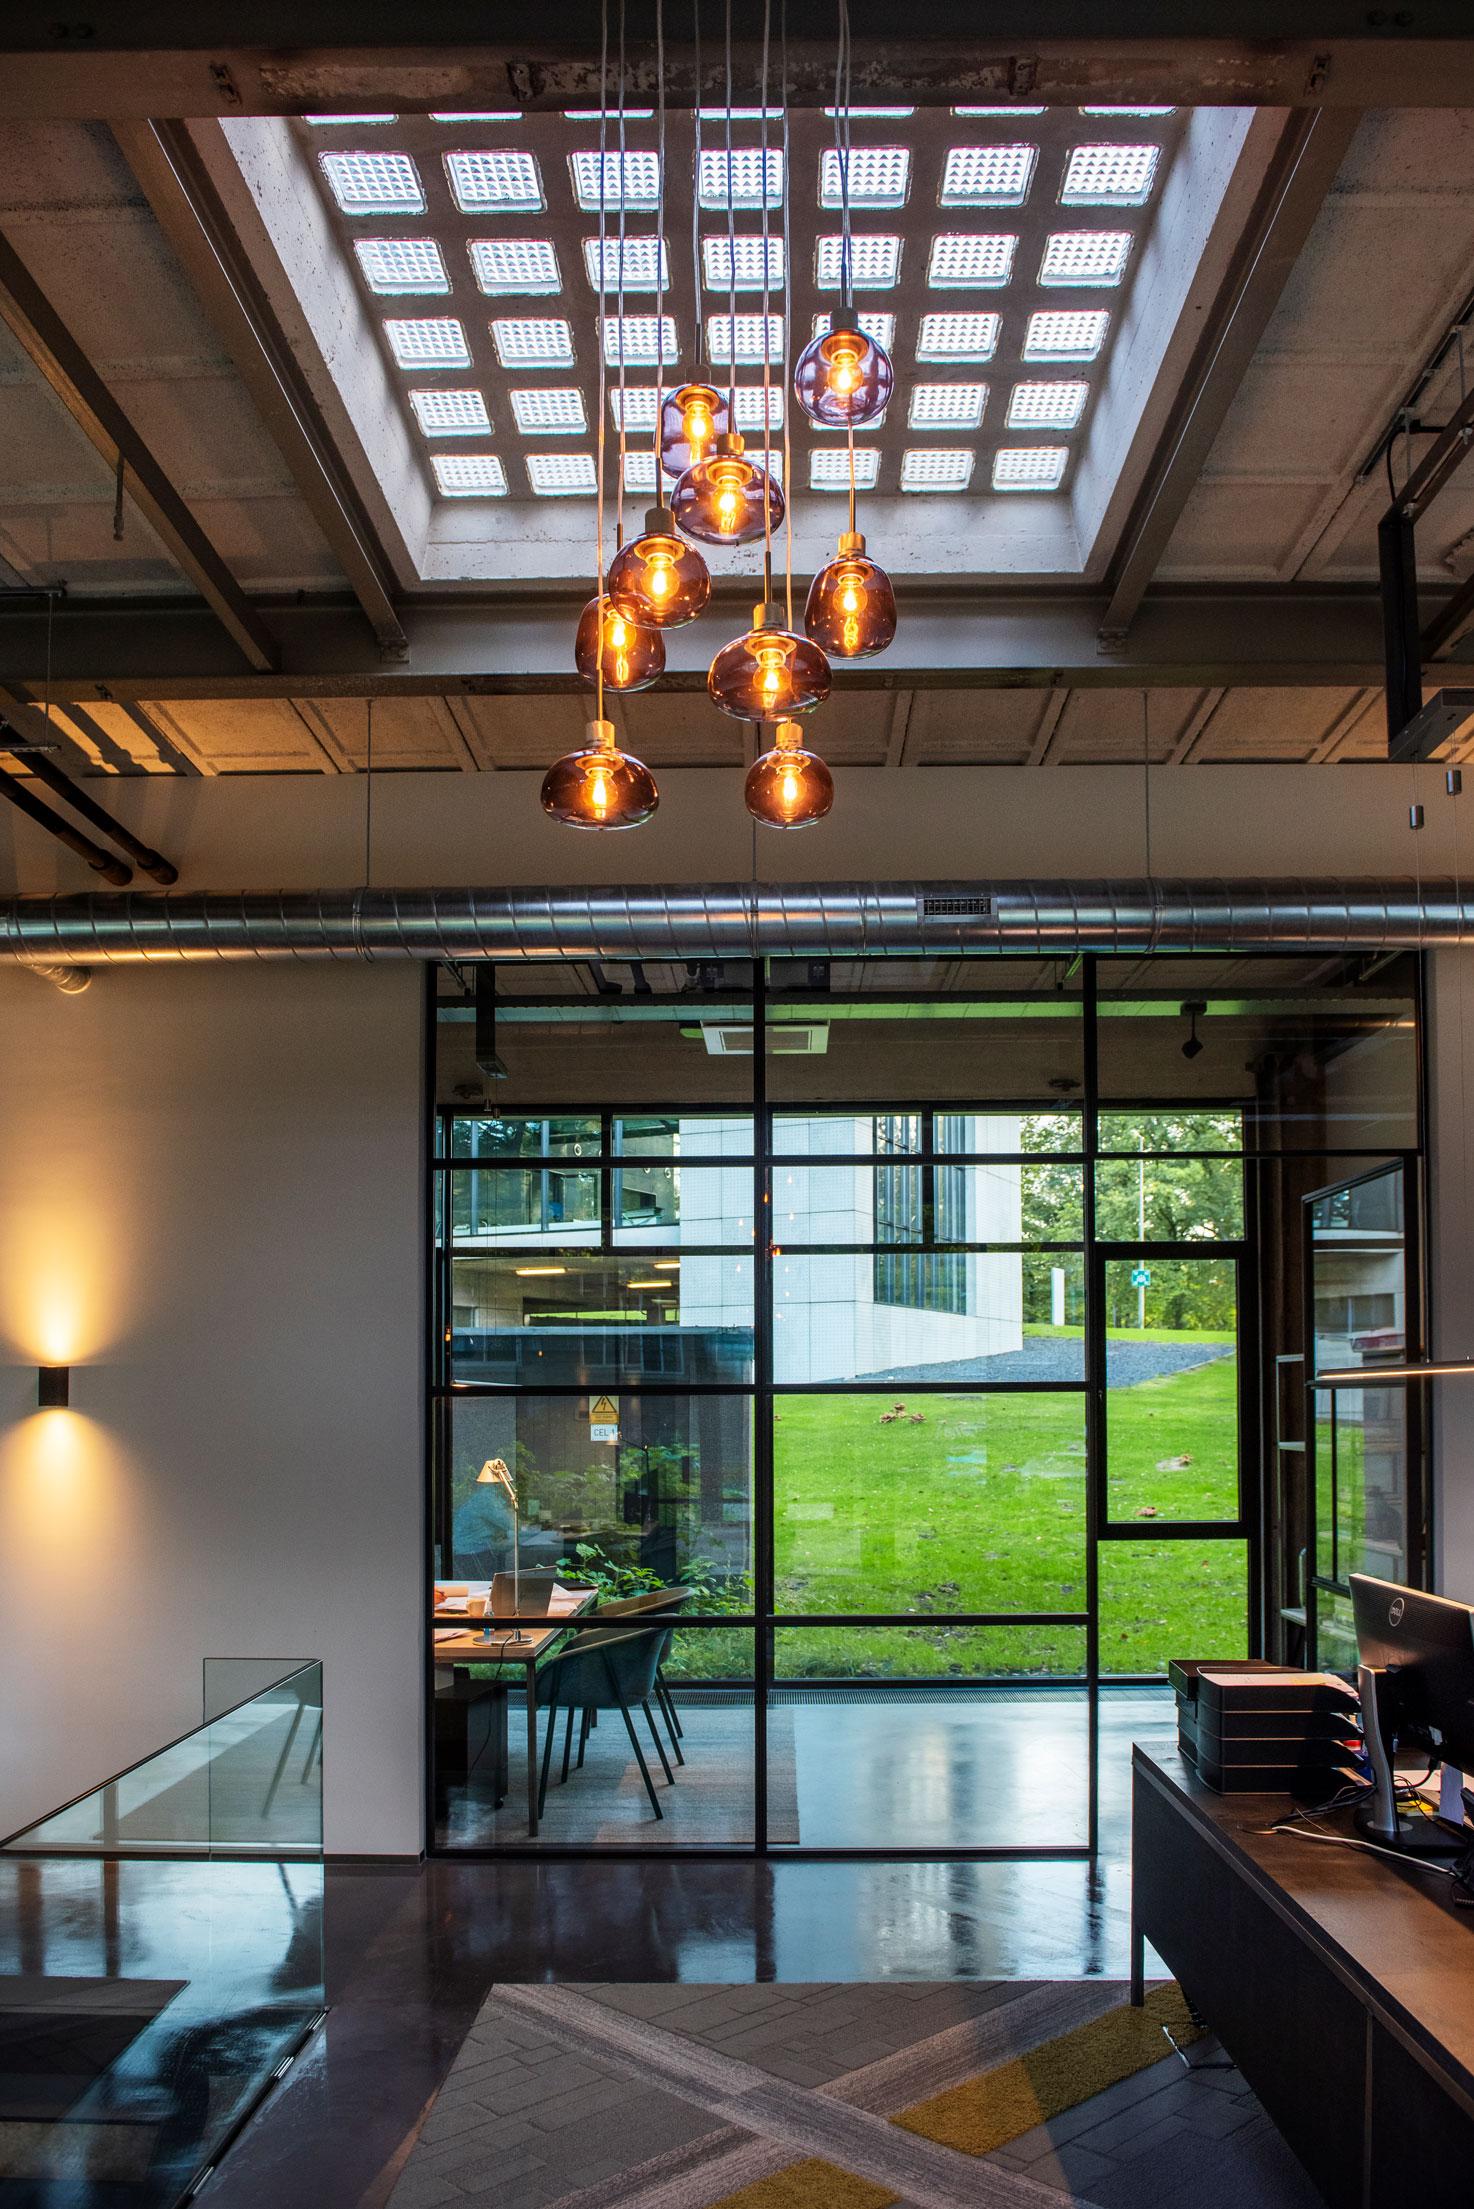 Arnhems-Buiten_B09_Weusten-Liedenbaum-Architecten_interieur_kantoor